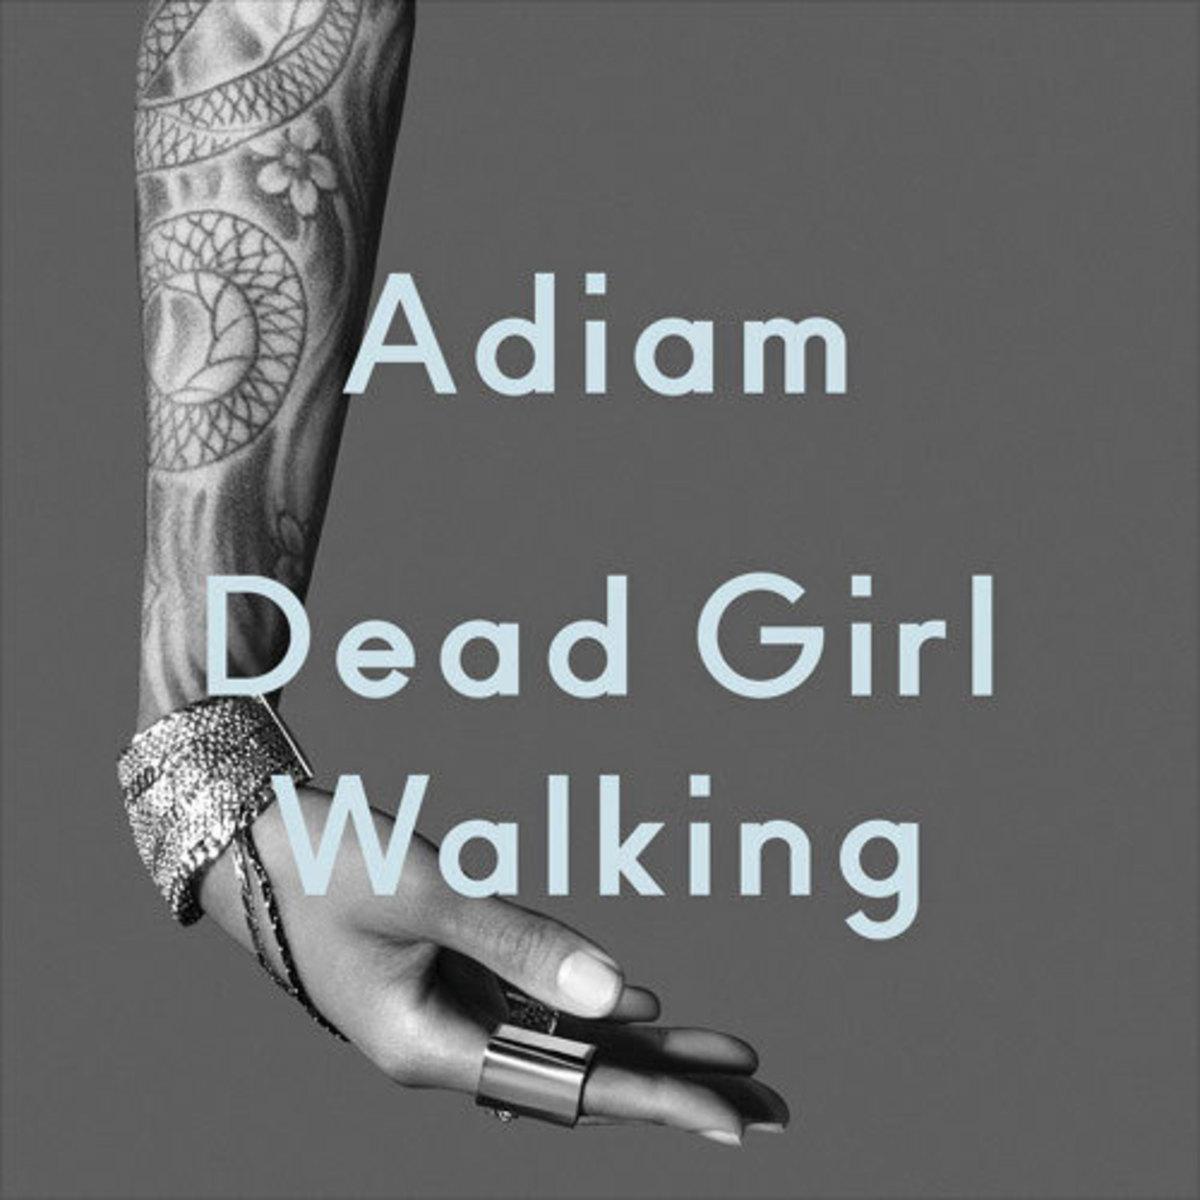 adiam-dead-girl-walking.jpg